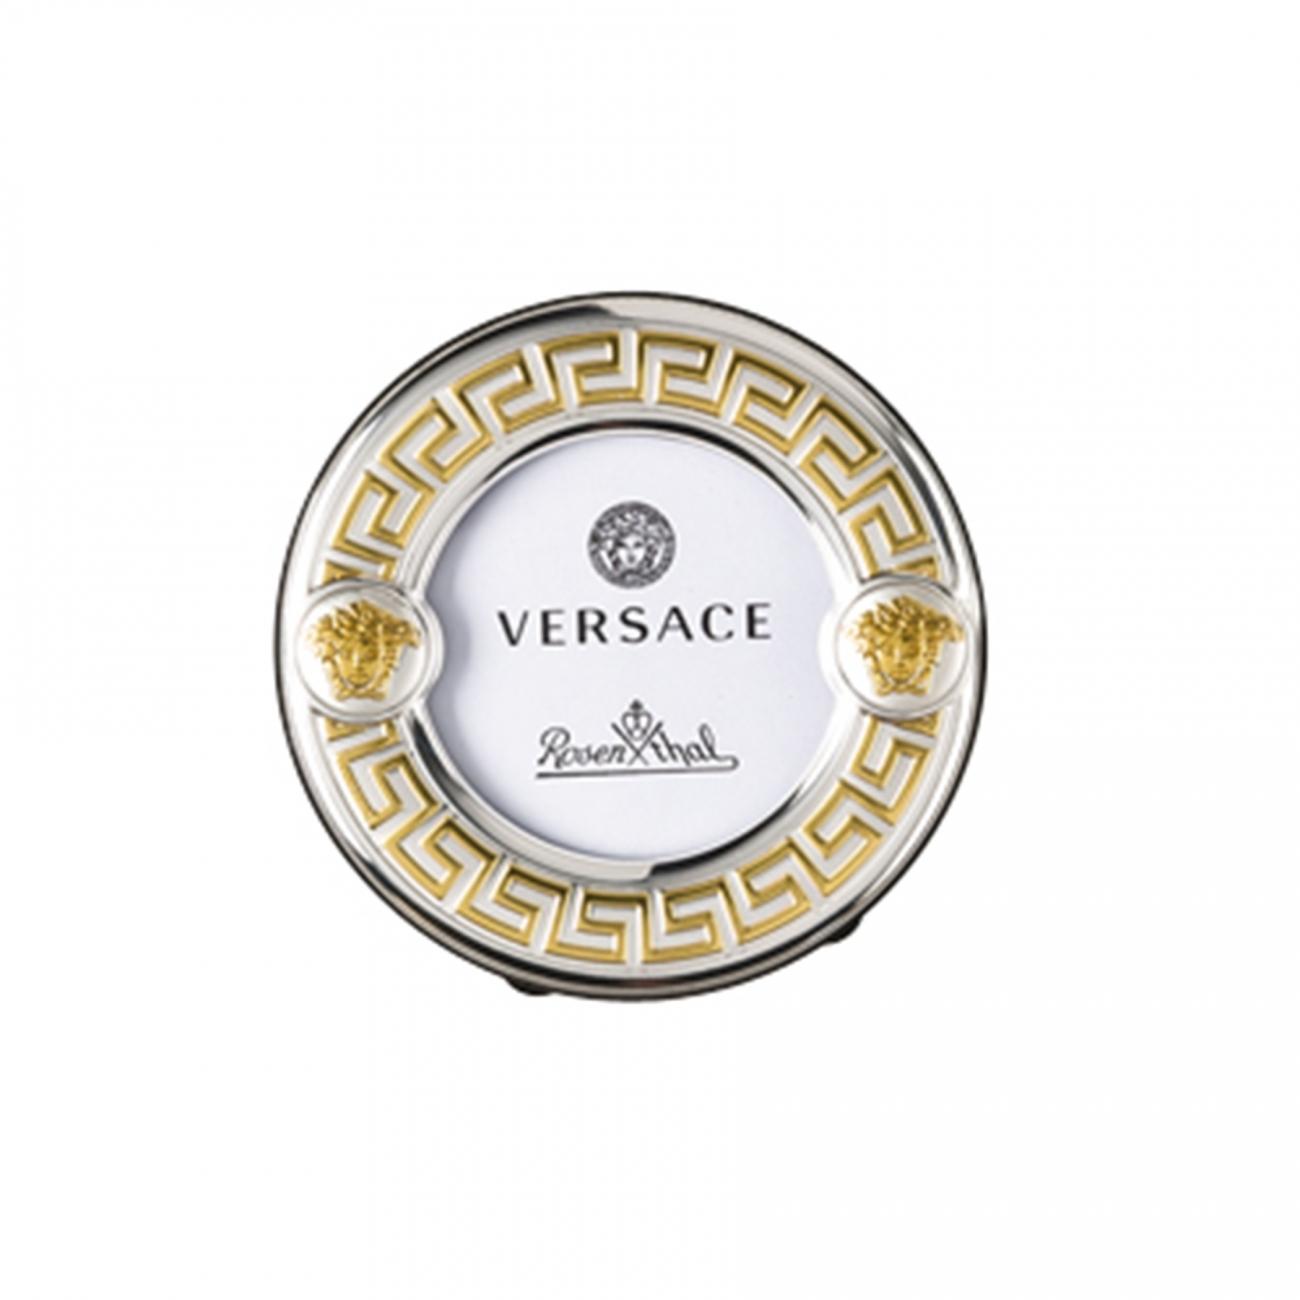 Rosenthal Versace Frames VHF4 Gold Portafotografie